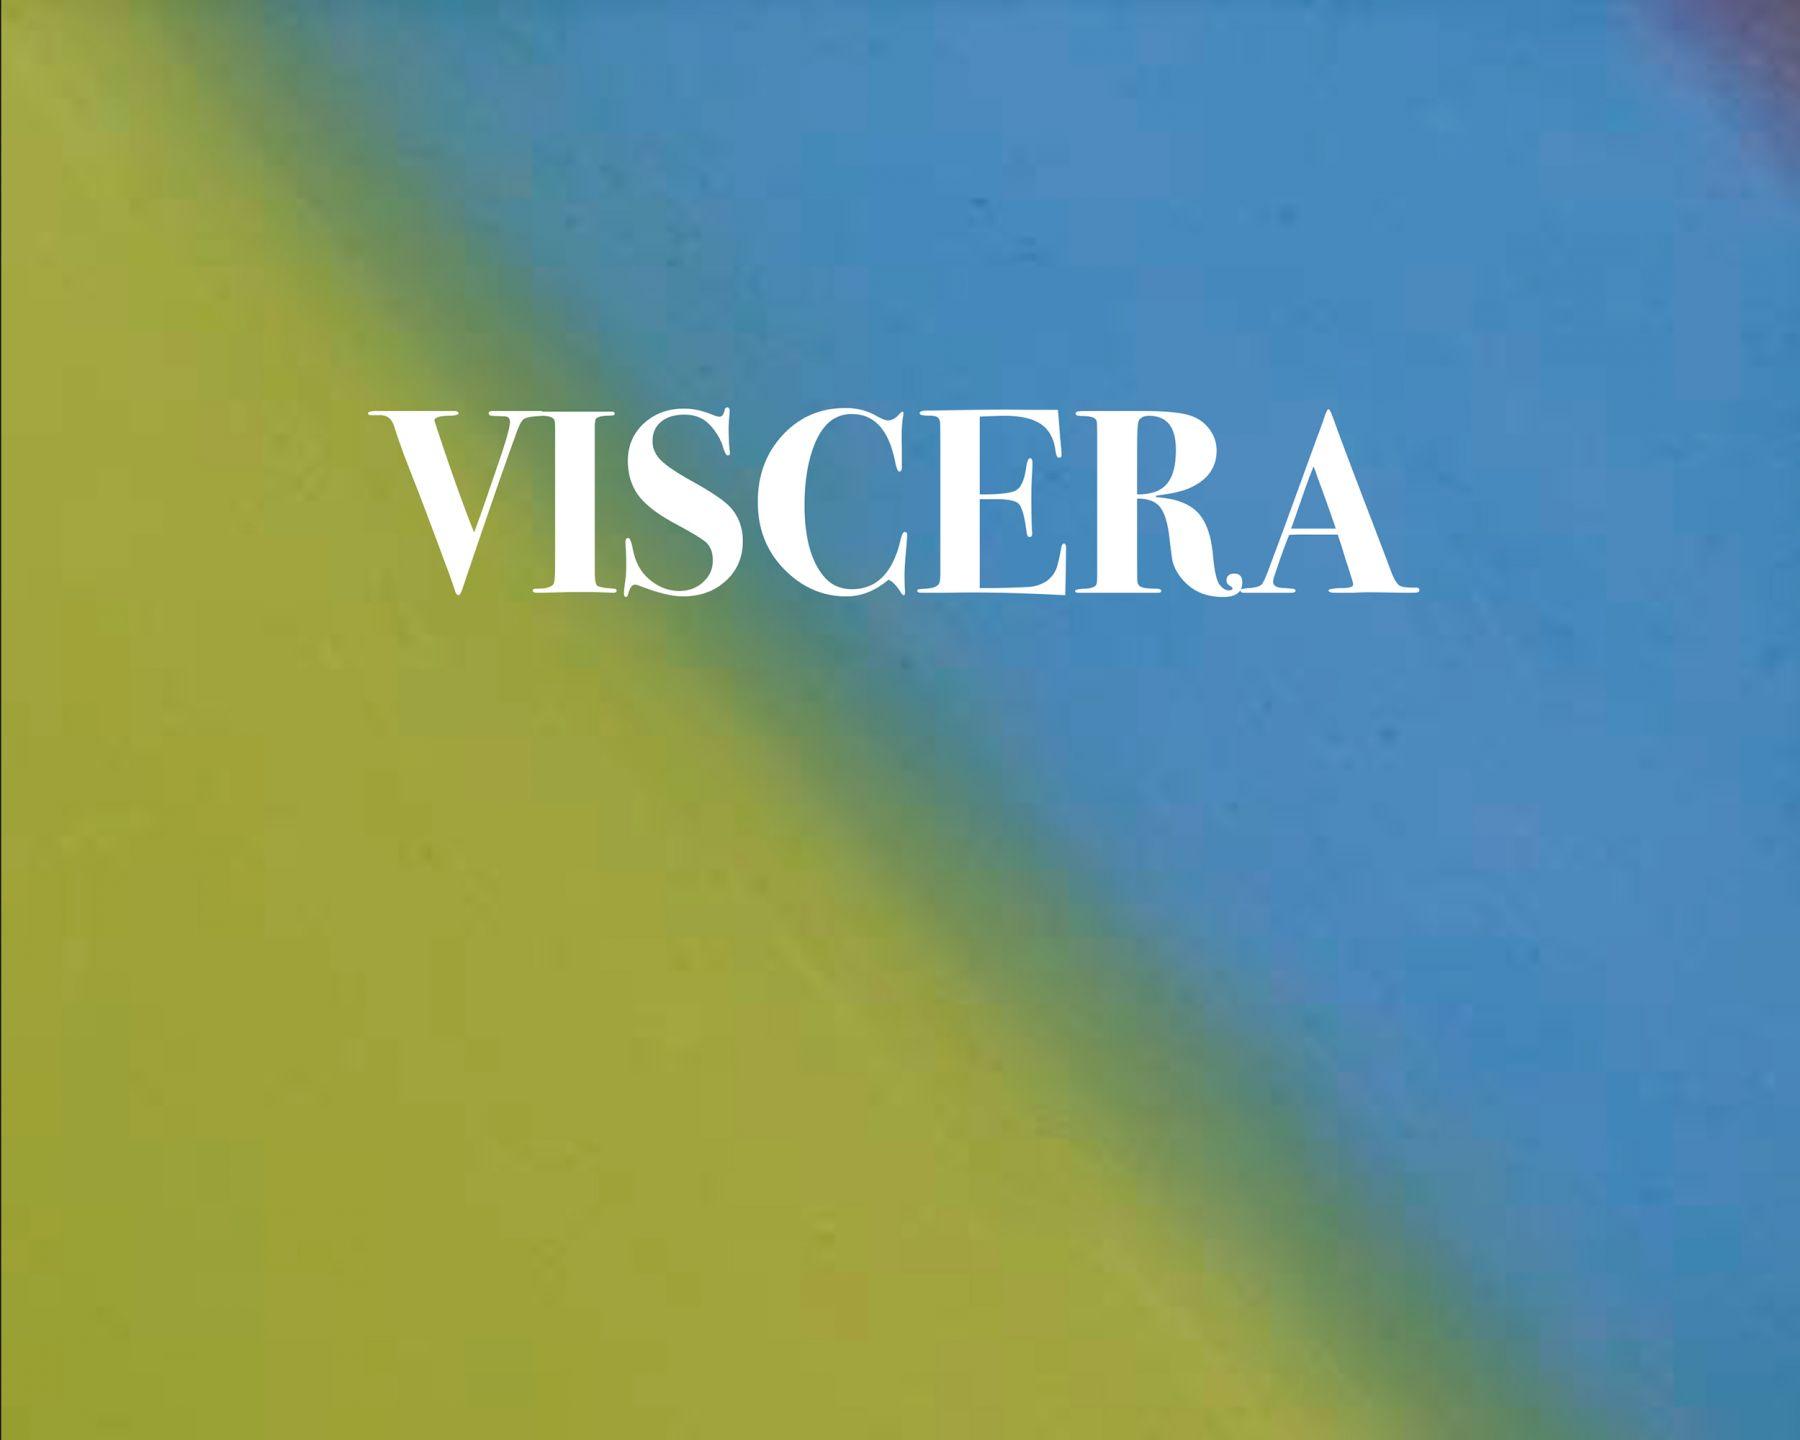 Cover image of Dan Colen: Viscera, published by Venus Over Los Angeles, Los Angeles, 2016